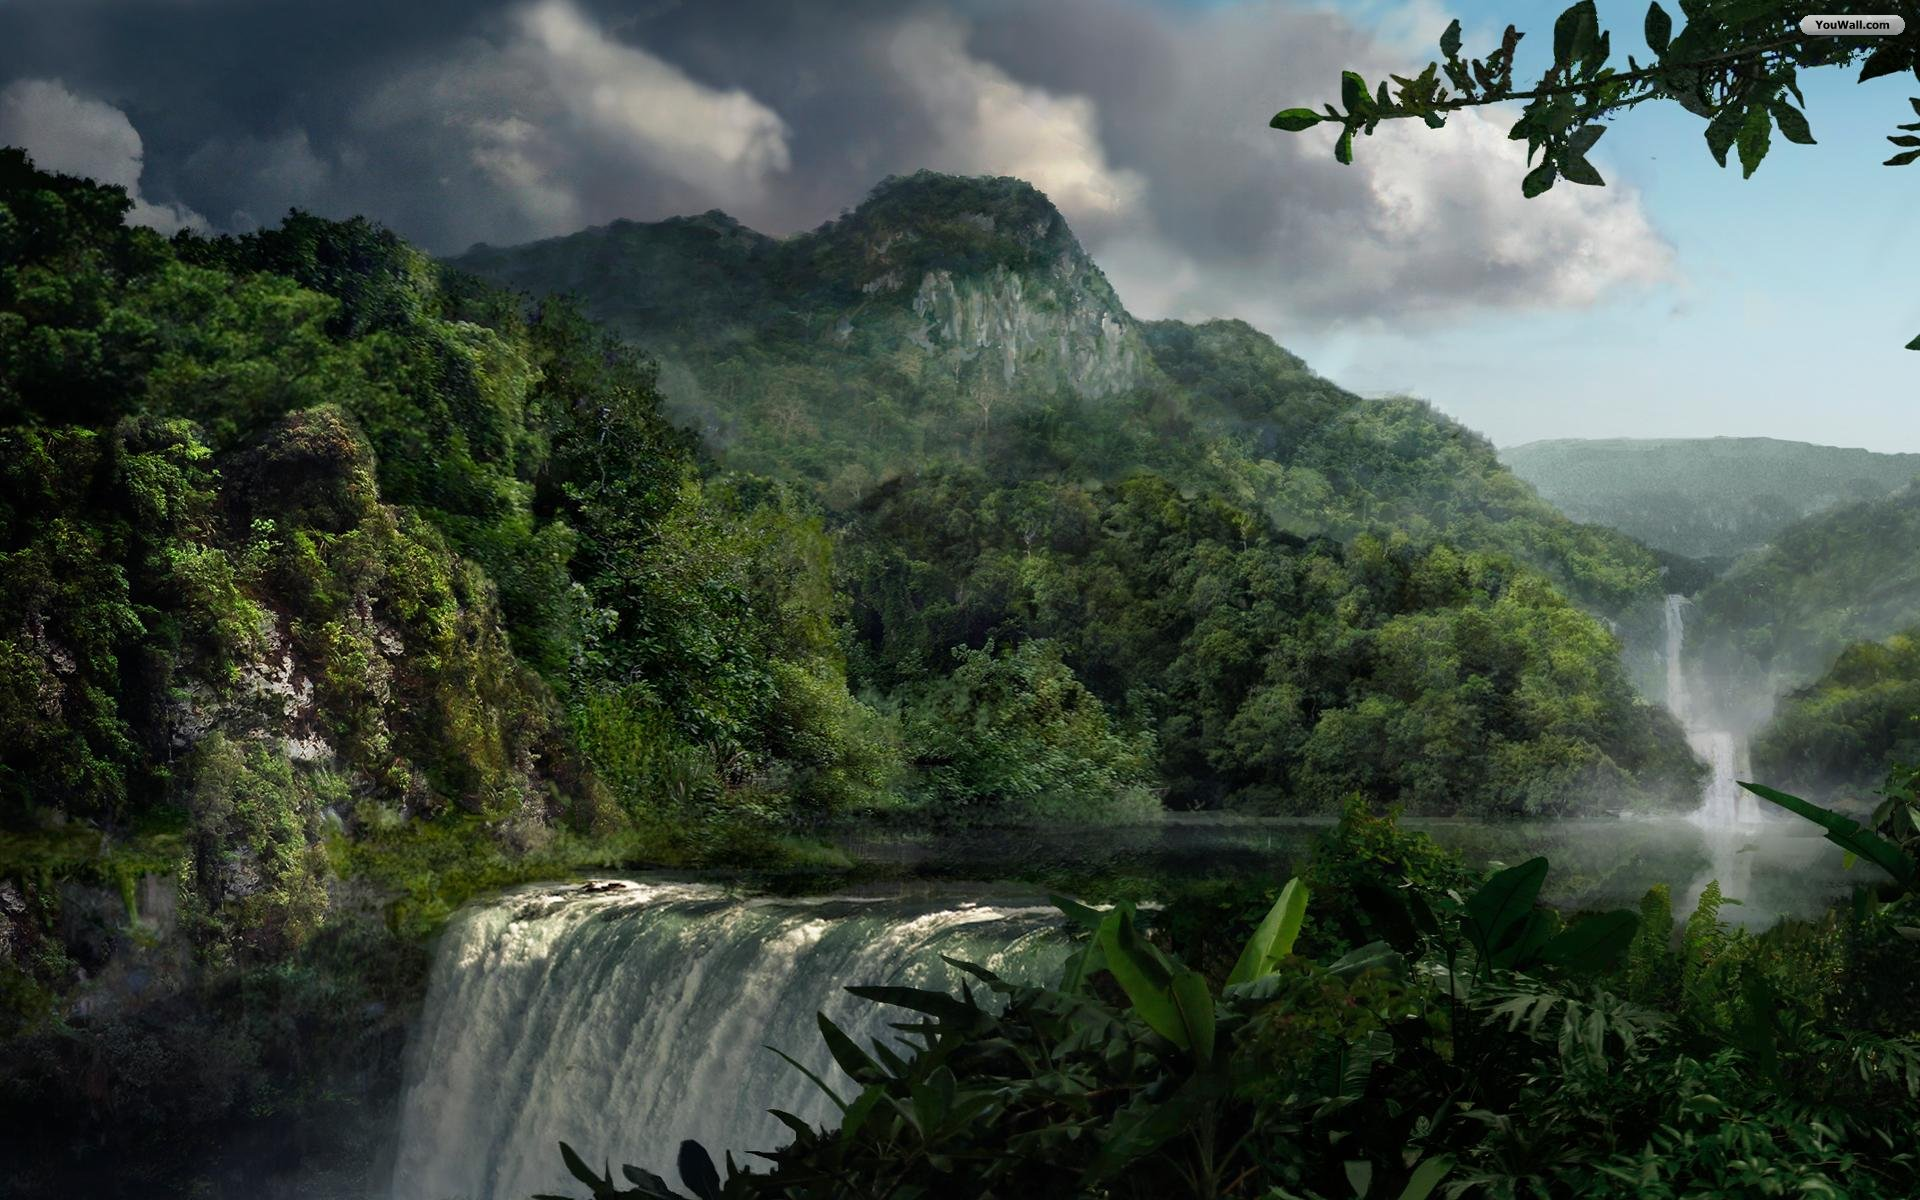 Jungle Waterfalls Wallpaper   wallpaperwallpapersfree wallpaper 1920x1200